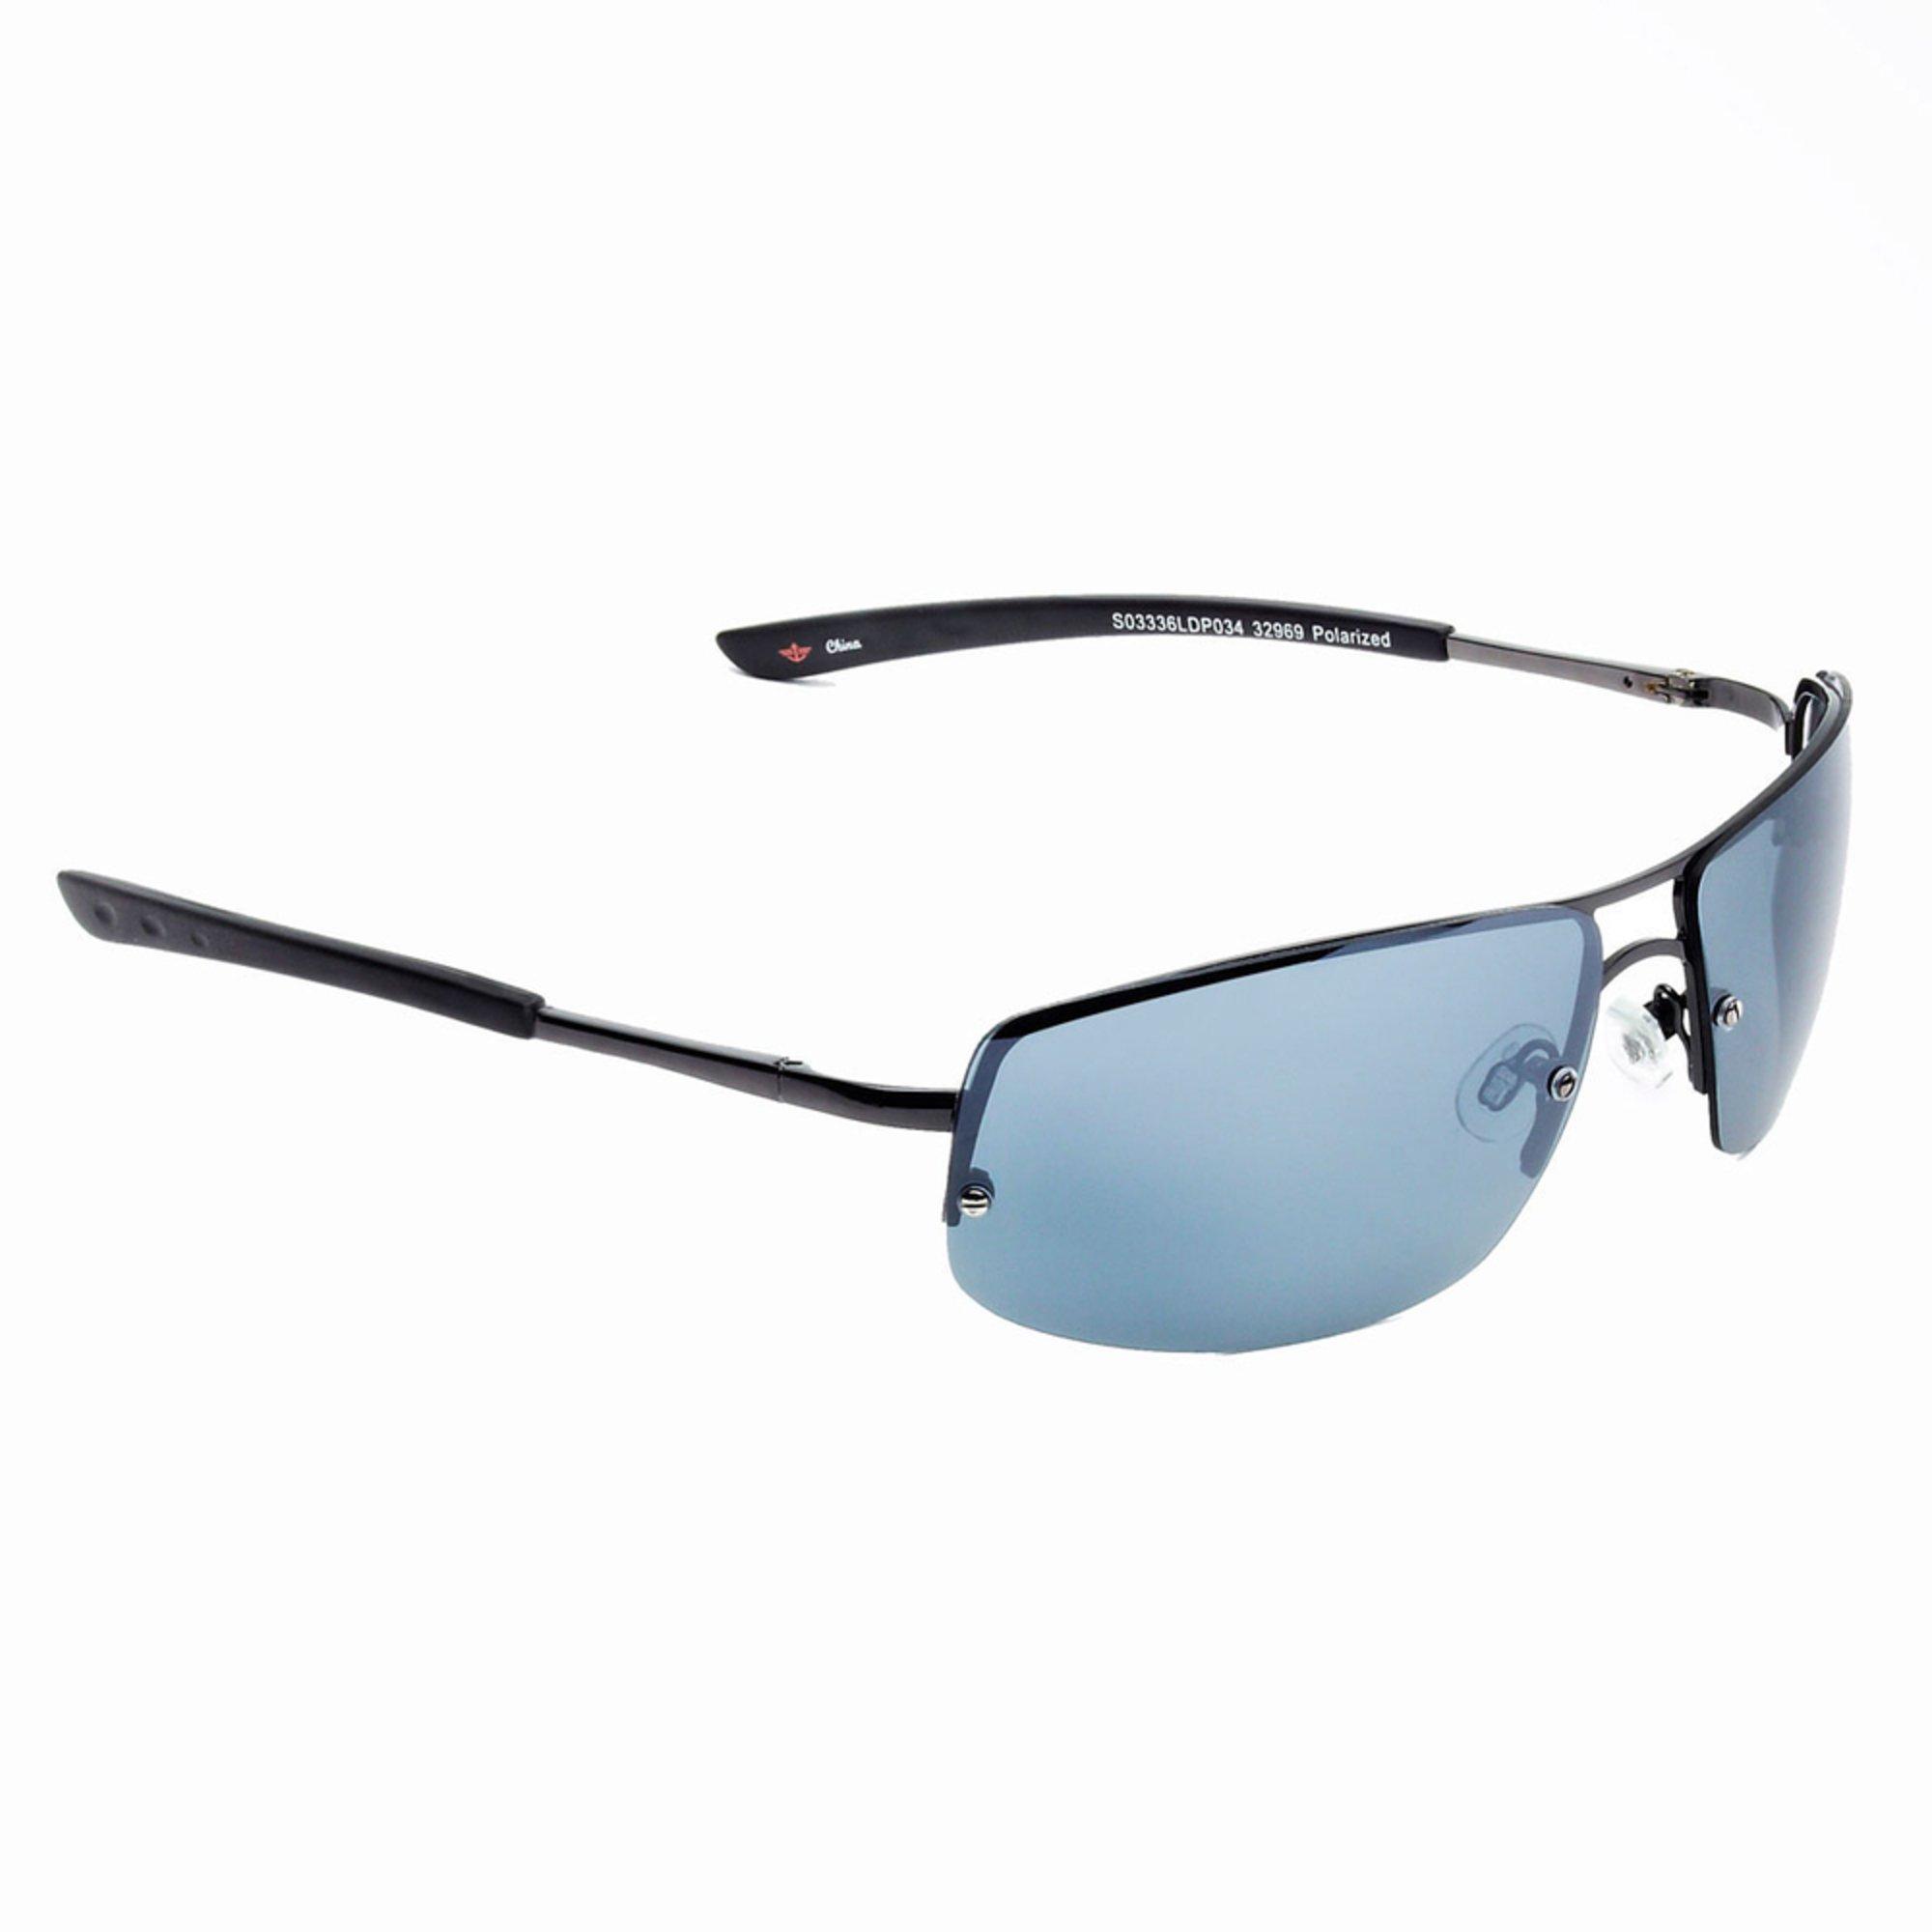 Dockers Mens Frameless Sunglasses Handbags ...